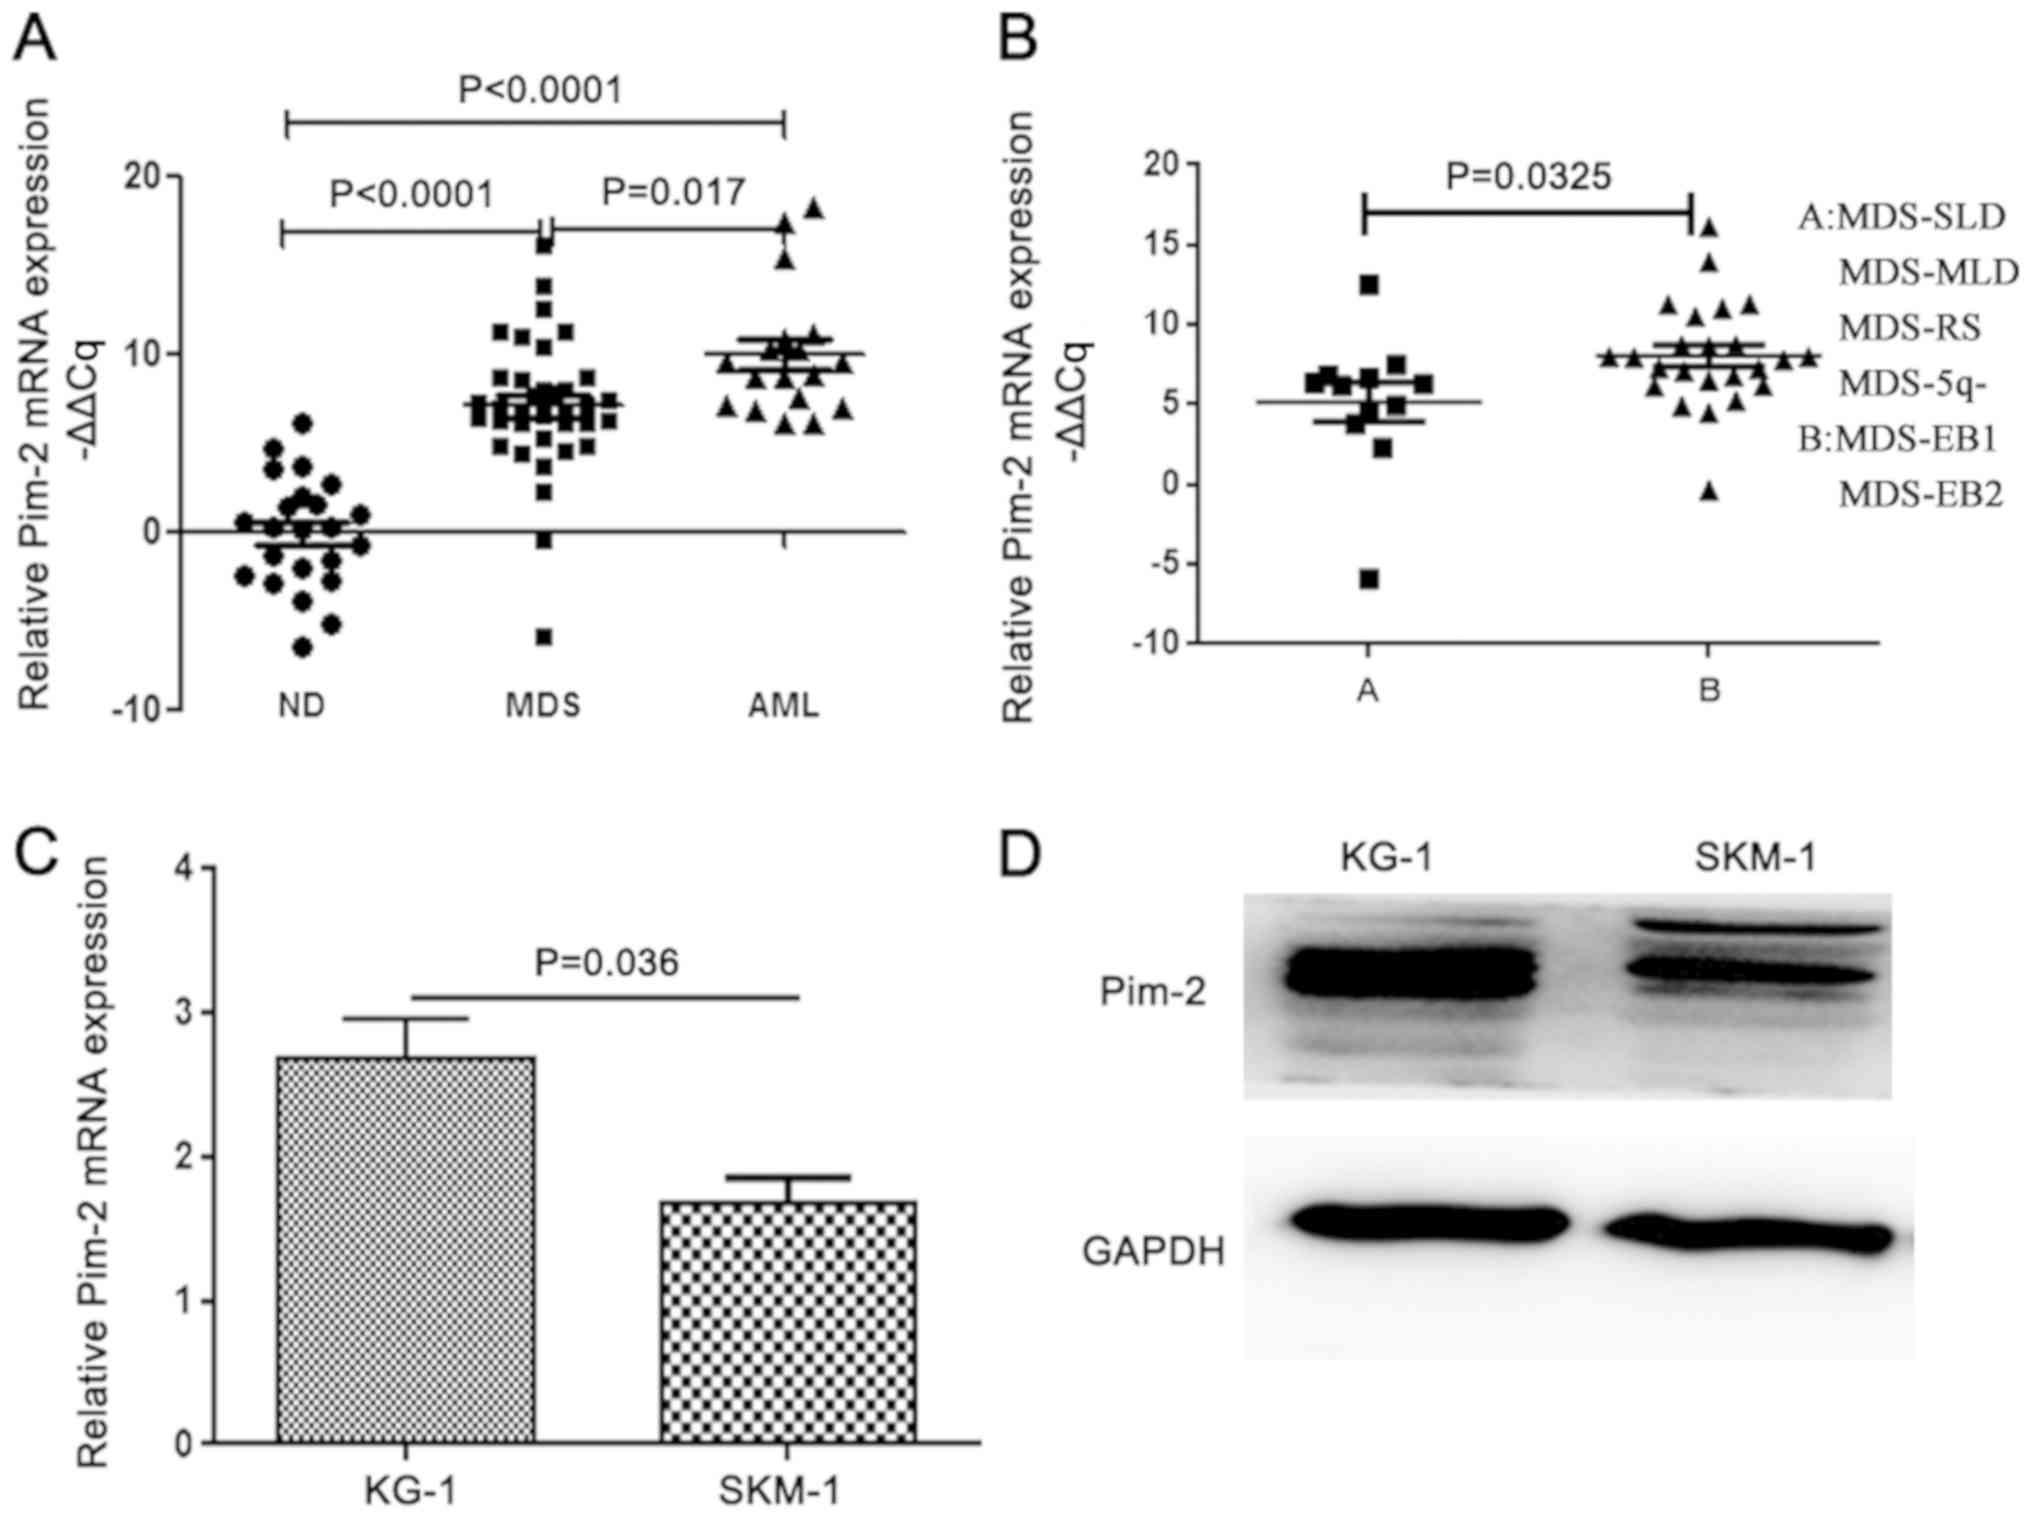 High expression of PIM2 induces HSC proliferation in myelodysplastic